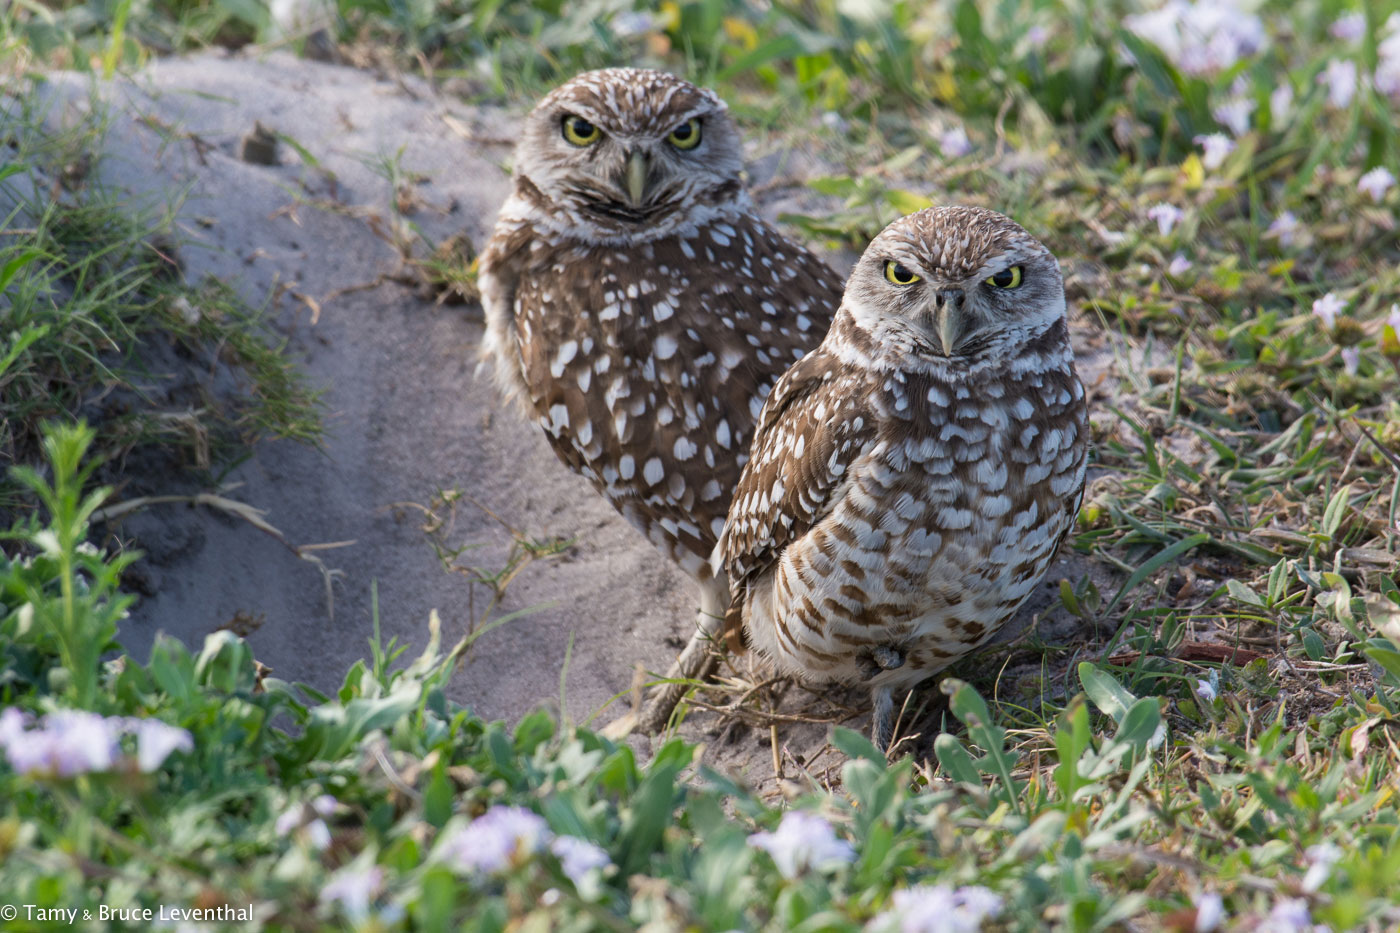 Burrowing Owl 1 ( Athene cunicularia )  Nikon D7100 + Nikon 200-500mm f5.6VR (Cropping Slightly)